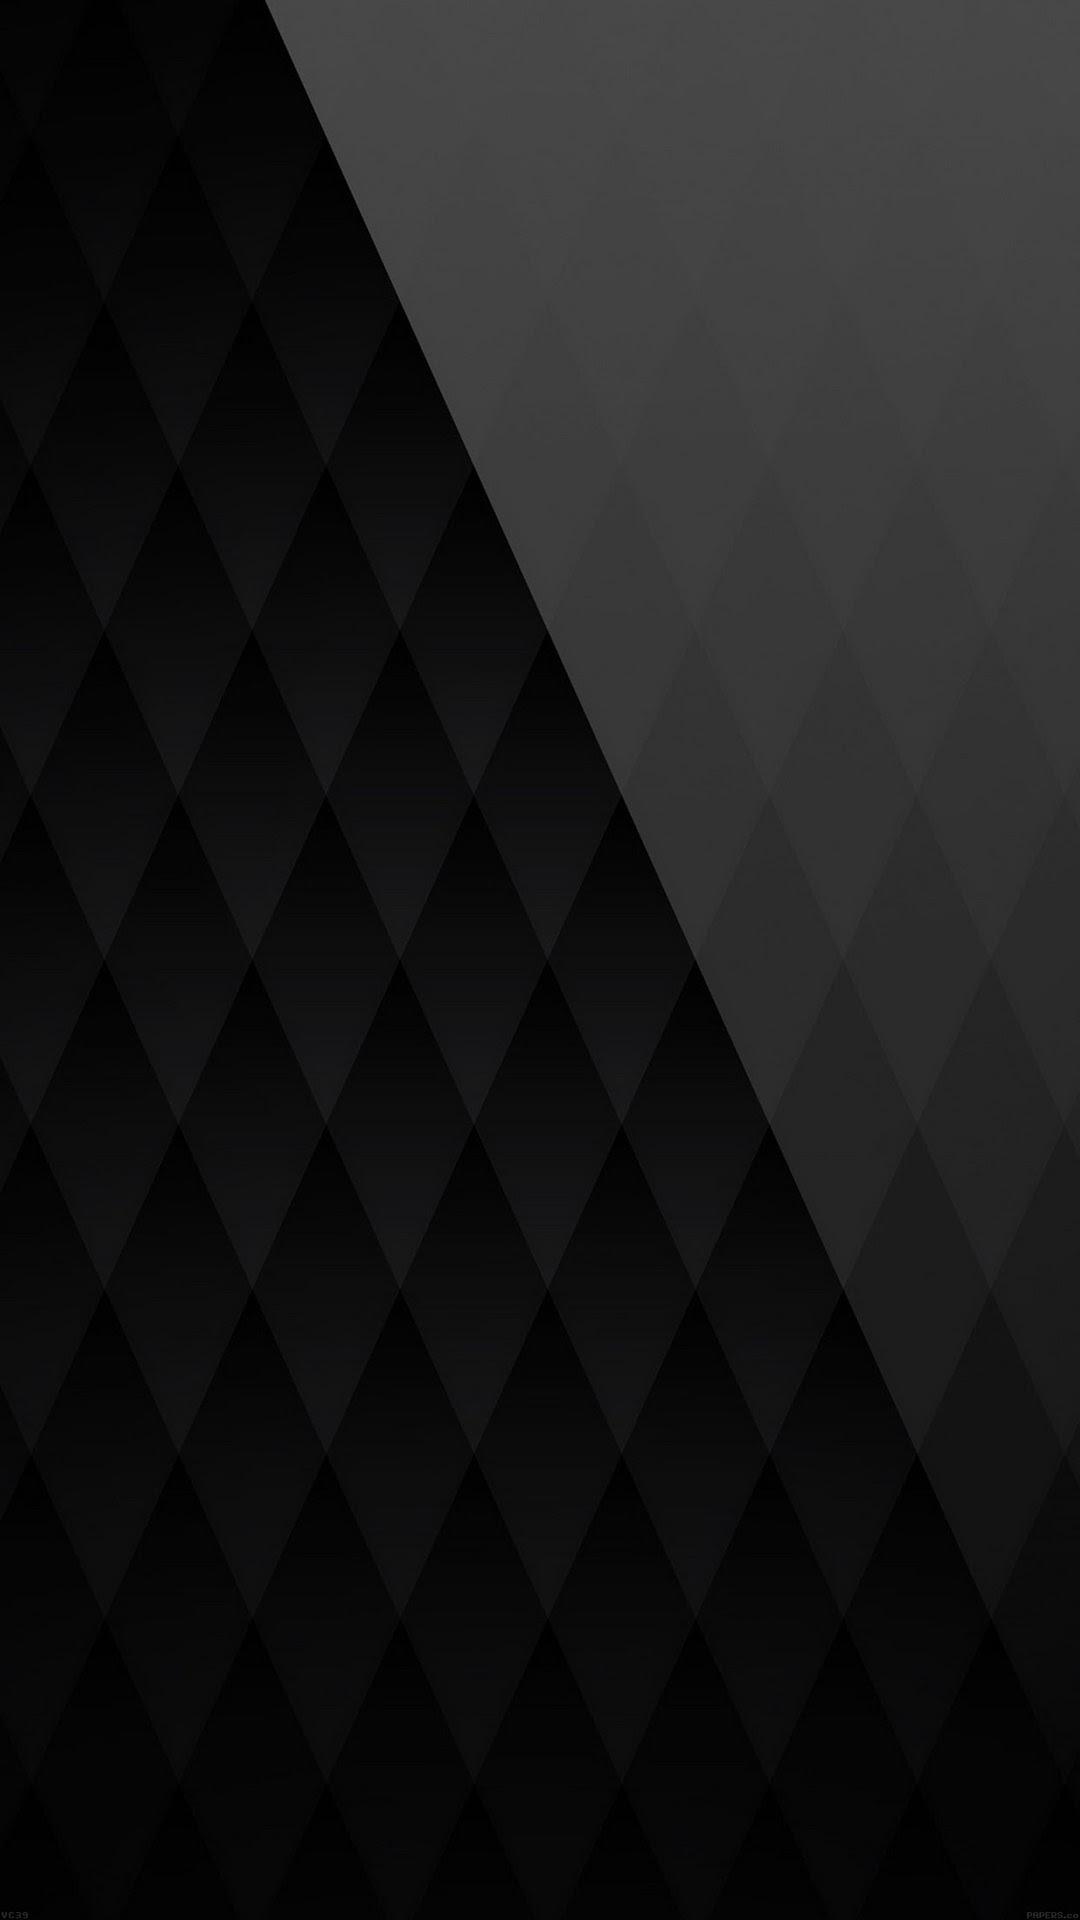 Black diamond pattern